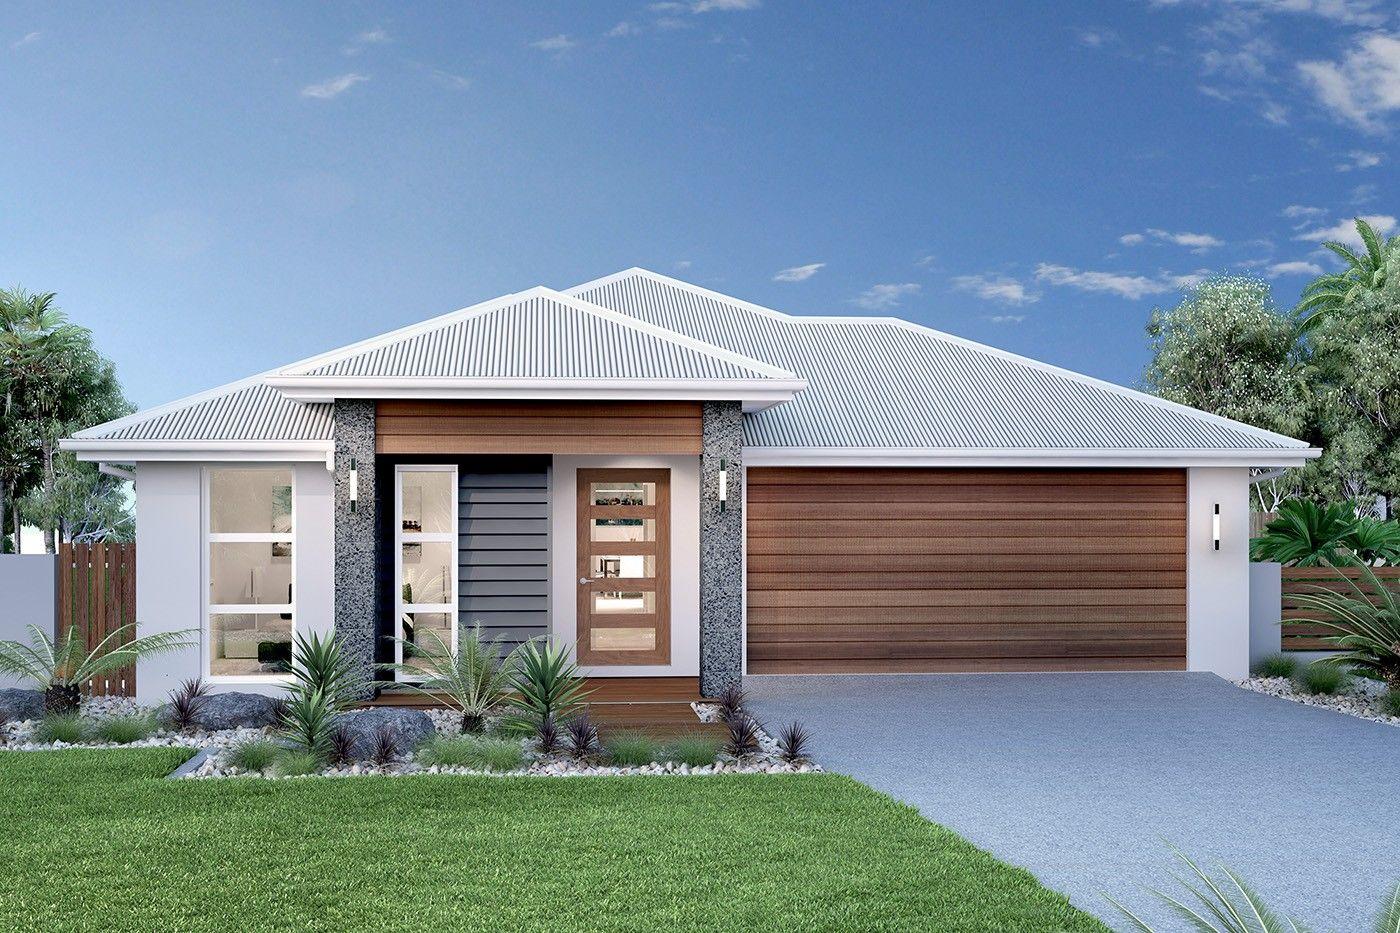 Lot 41 Taravale St, Harris Crossing, Bohle Plains QLD 4817, Image 0